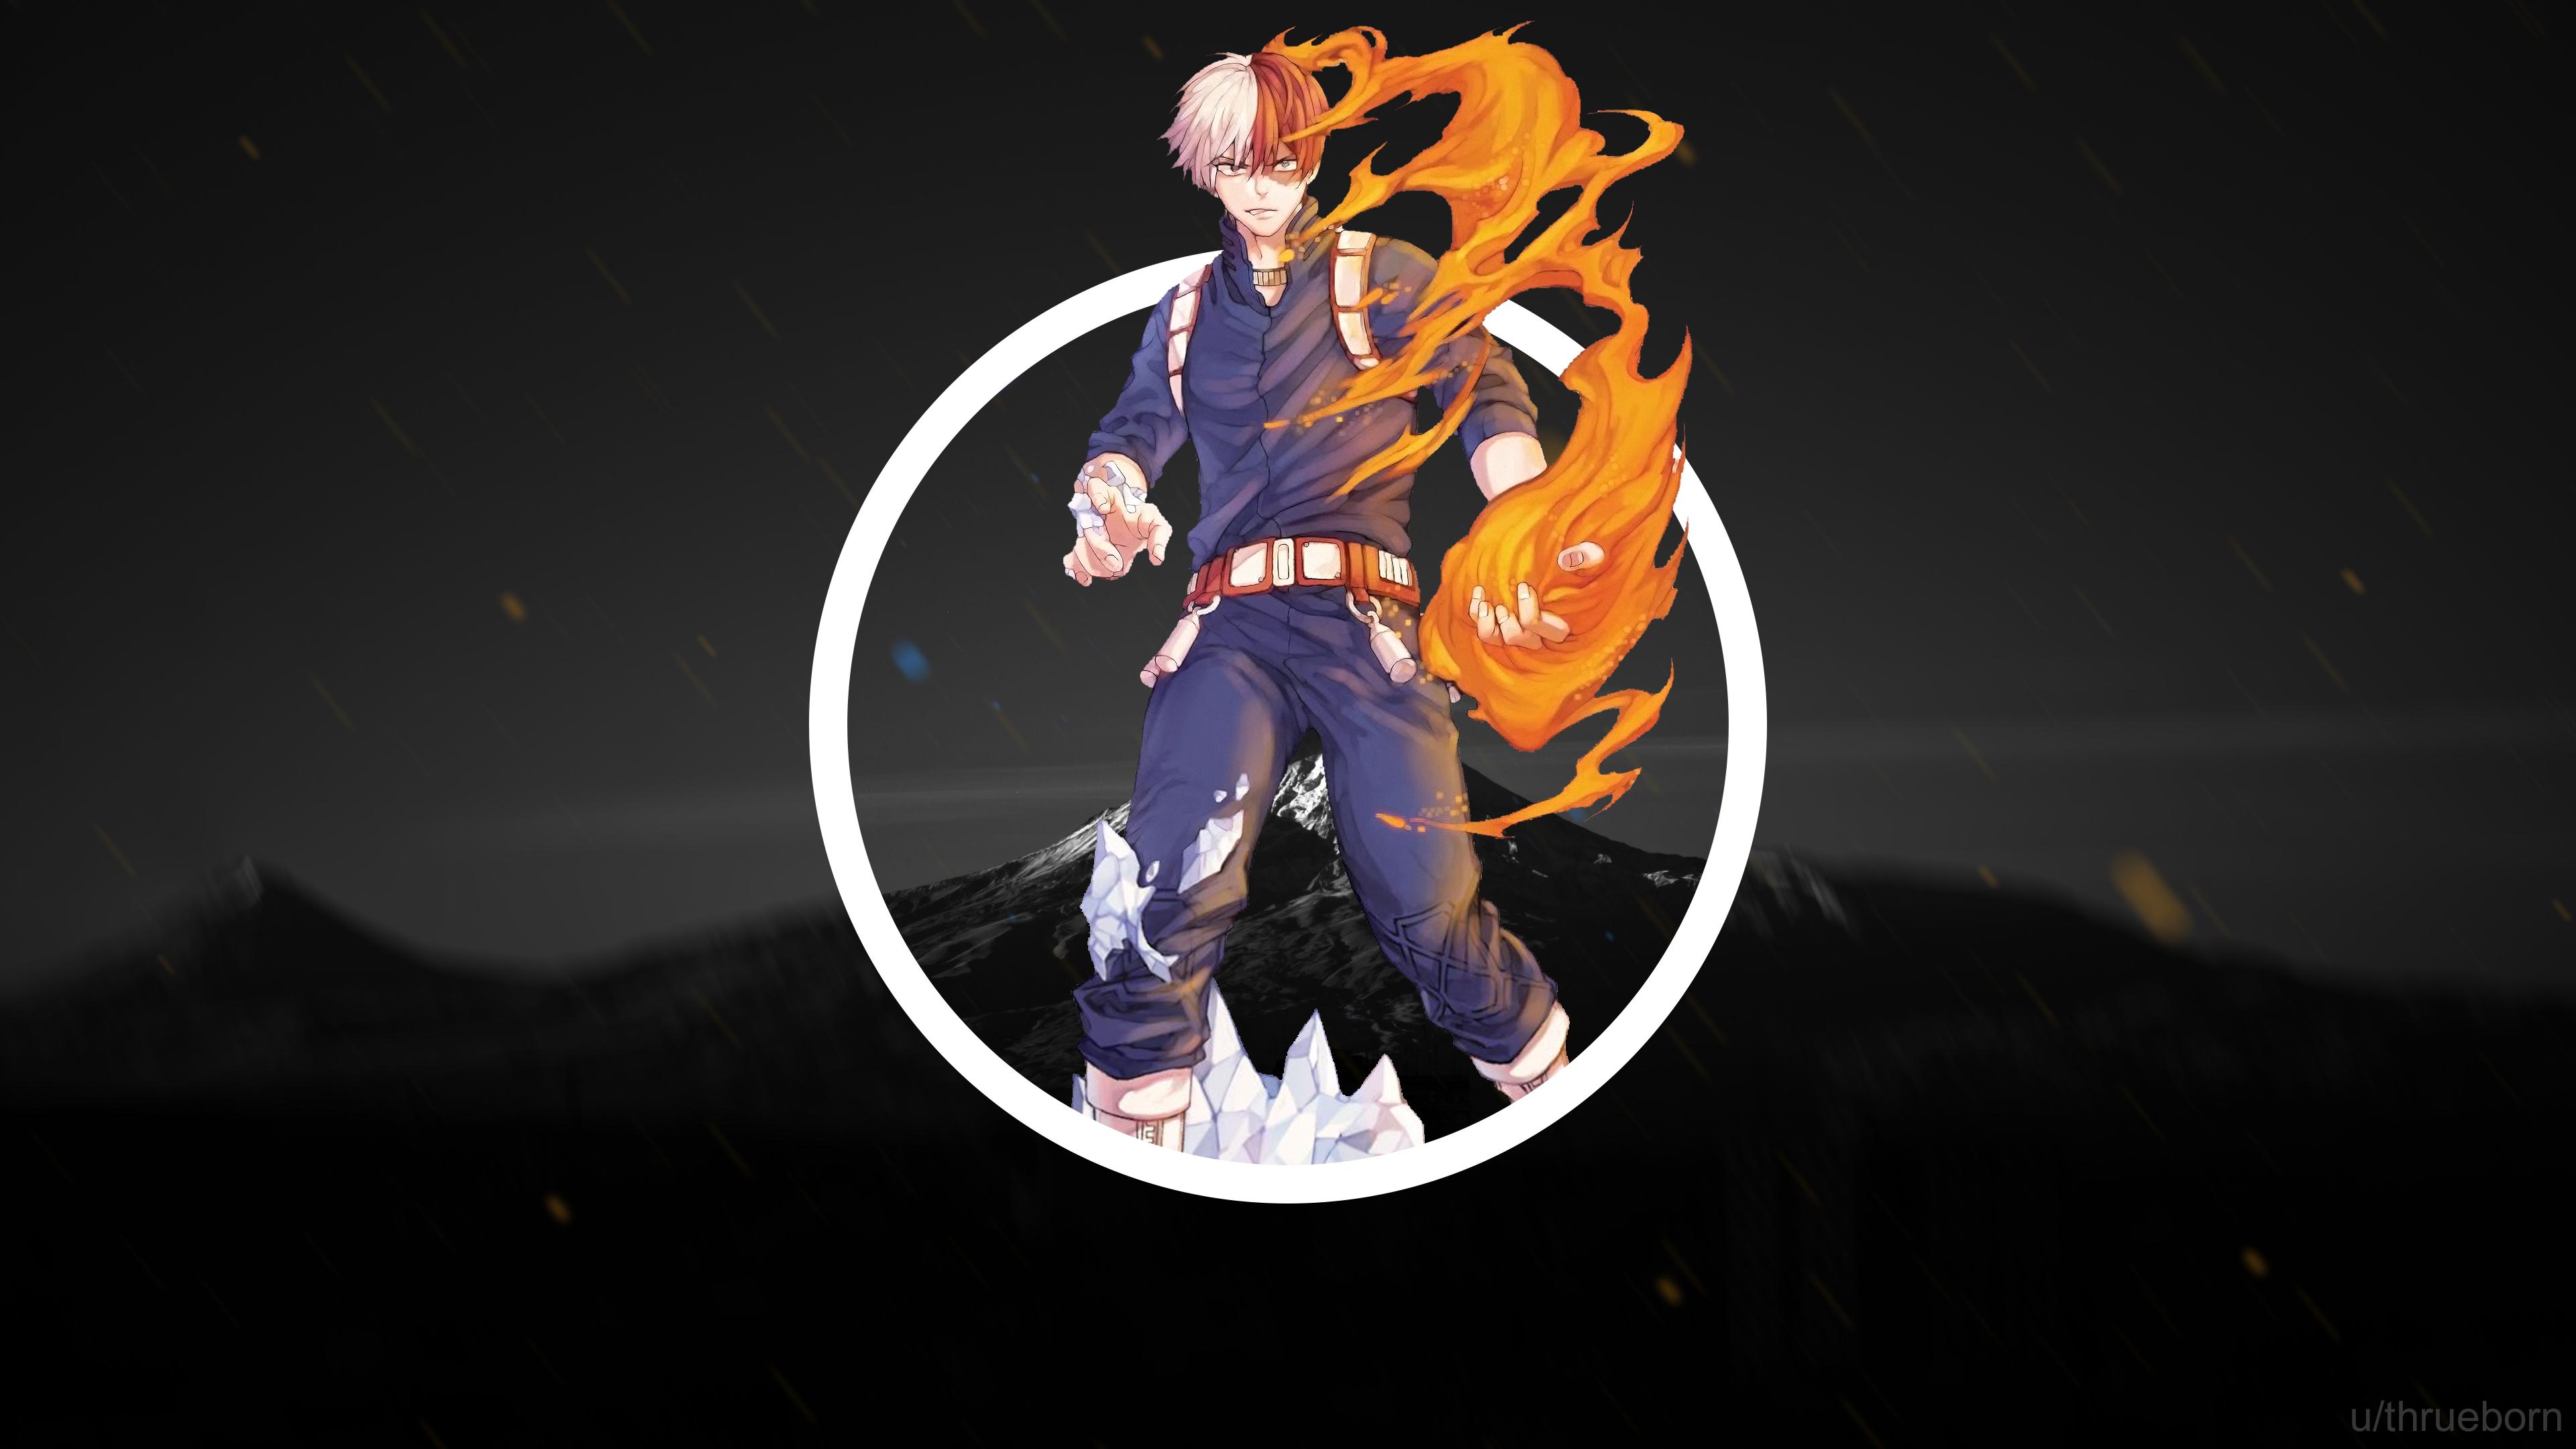 My Hero Academia: The Manga | My hero academia, Hero, Boku ...